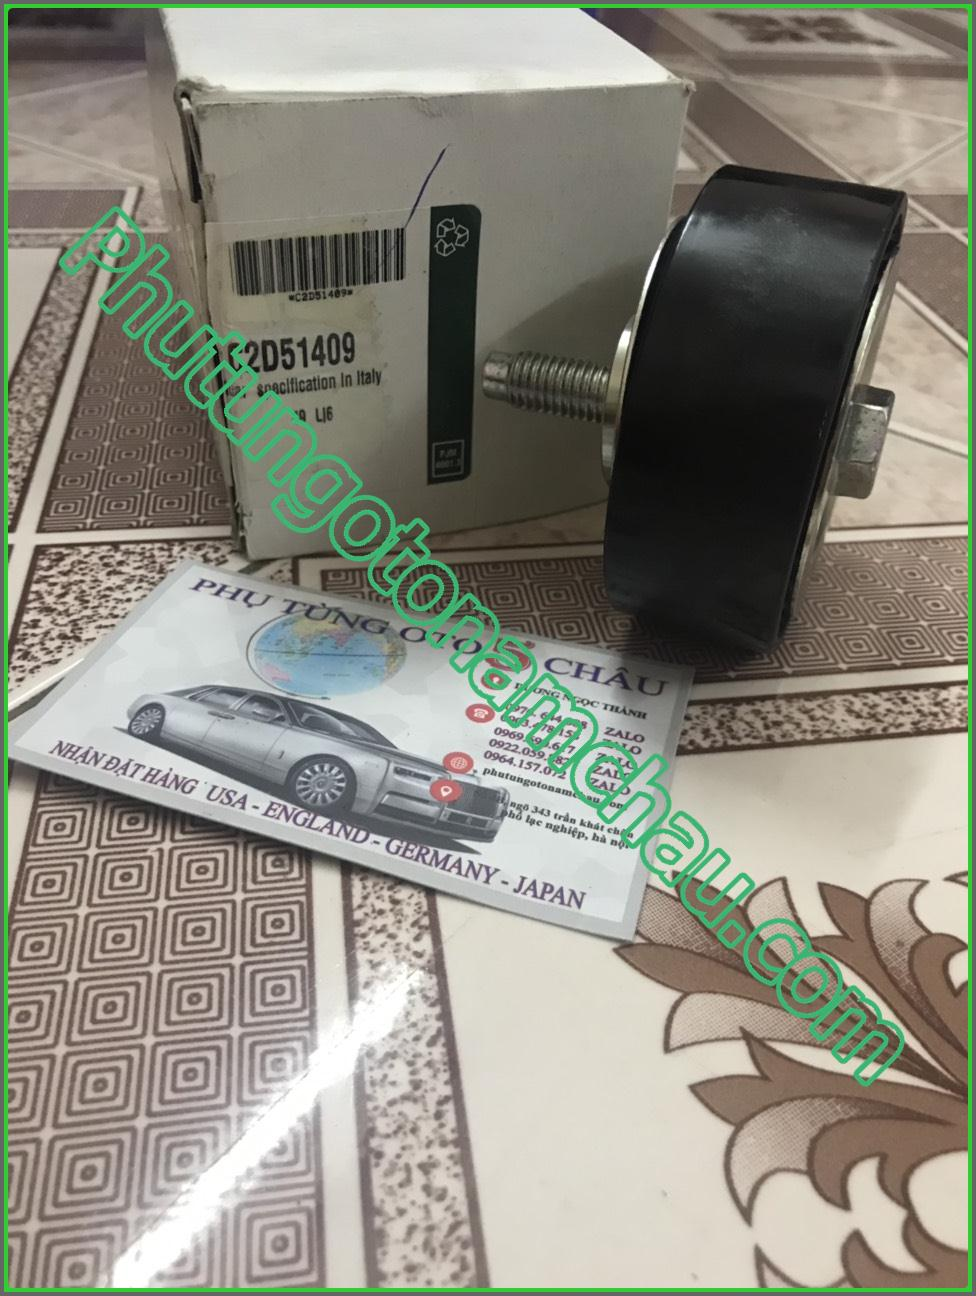 Bi Tì Trơn Land Rover - Jaguar C2D51409